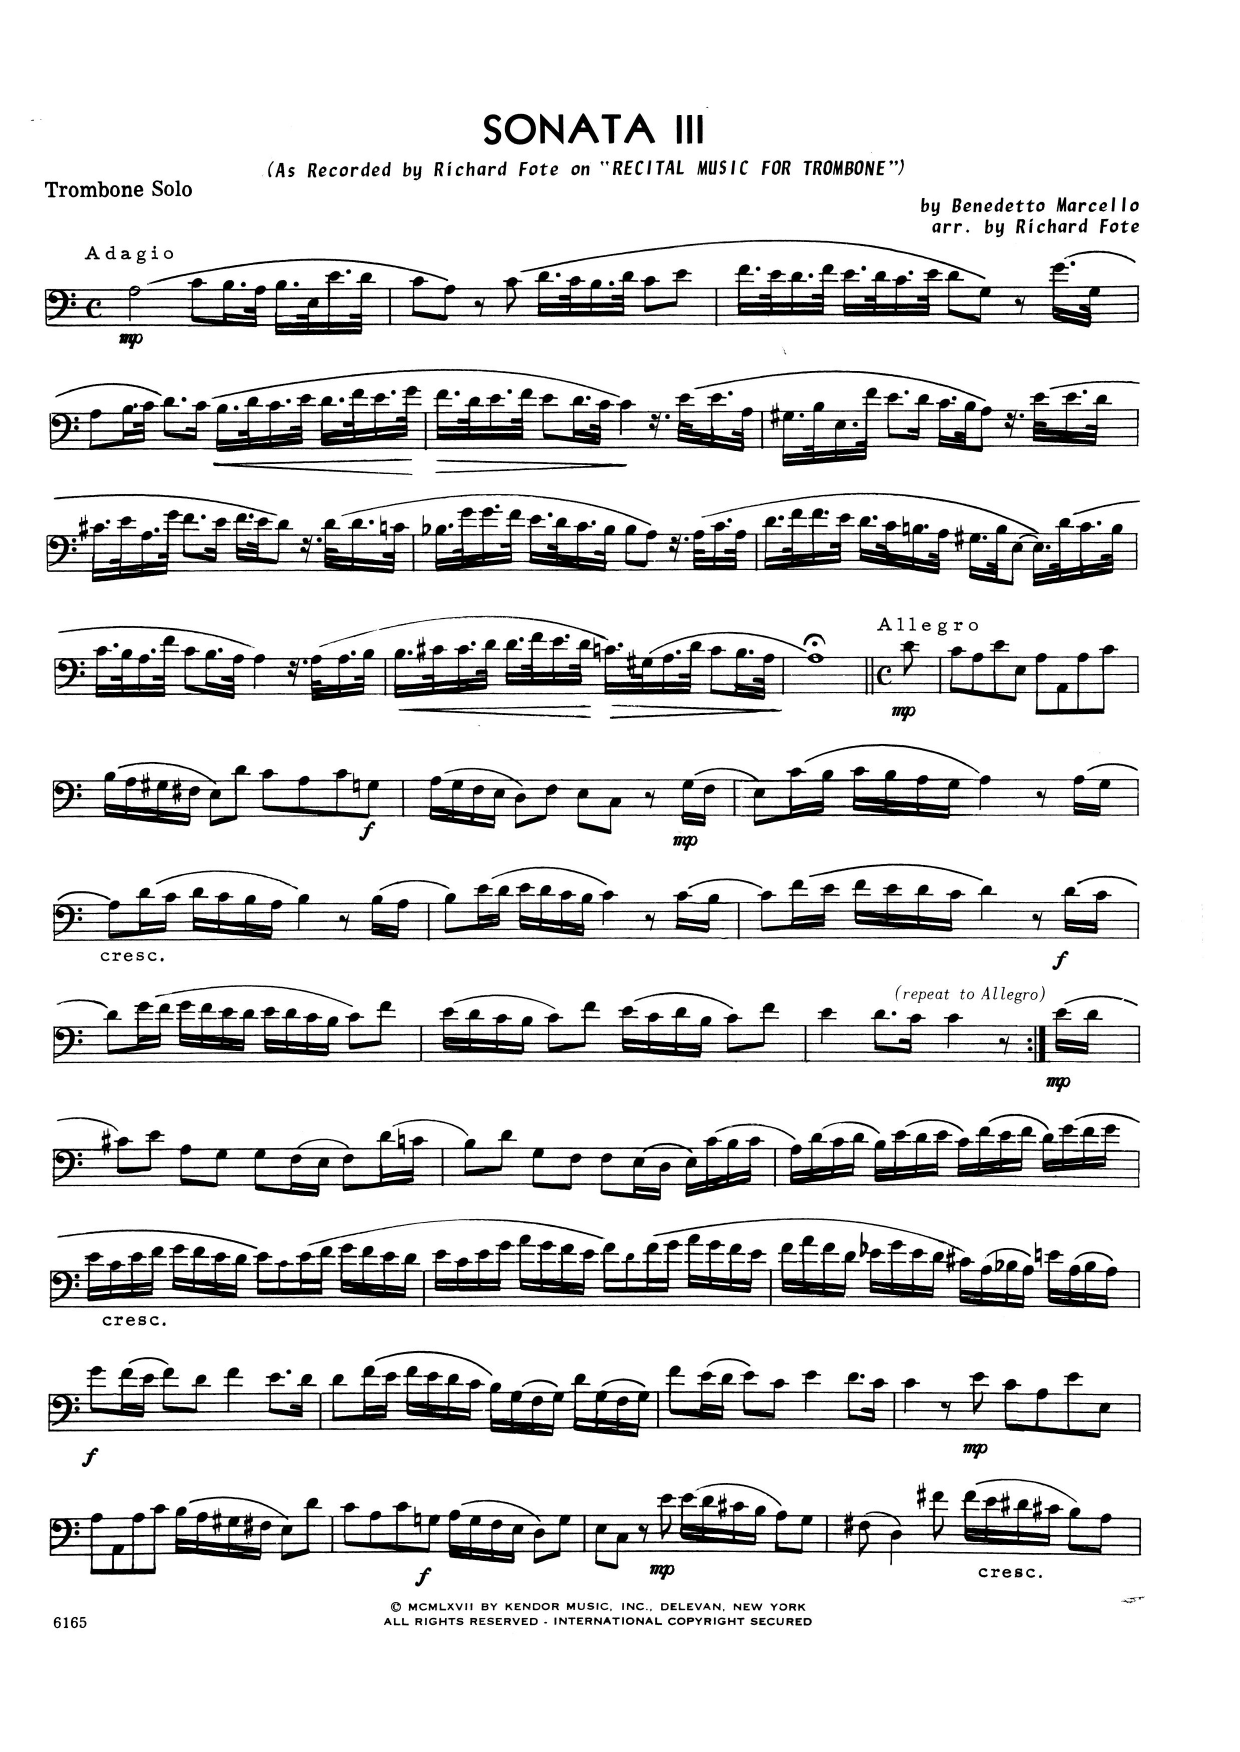 Richard Fote Sonata Iii - Trombone sheet music notes and chords. Download Printable PDF.